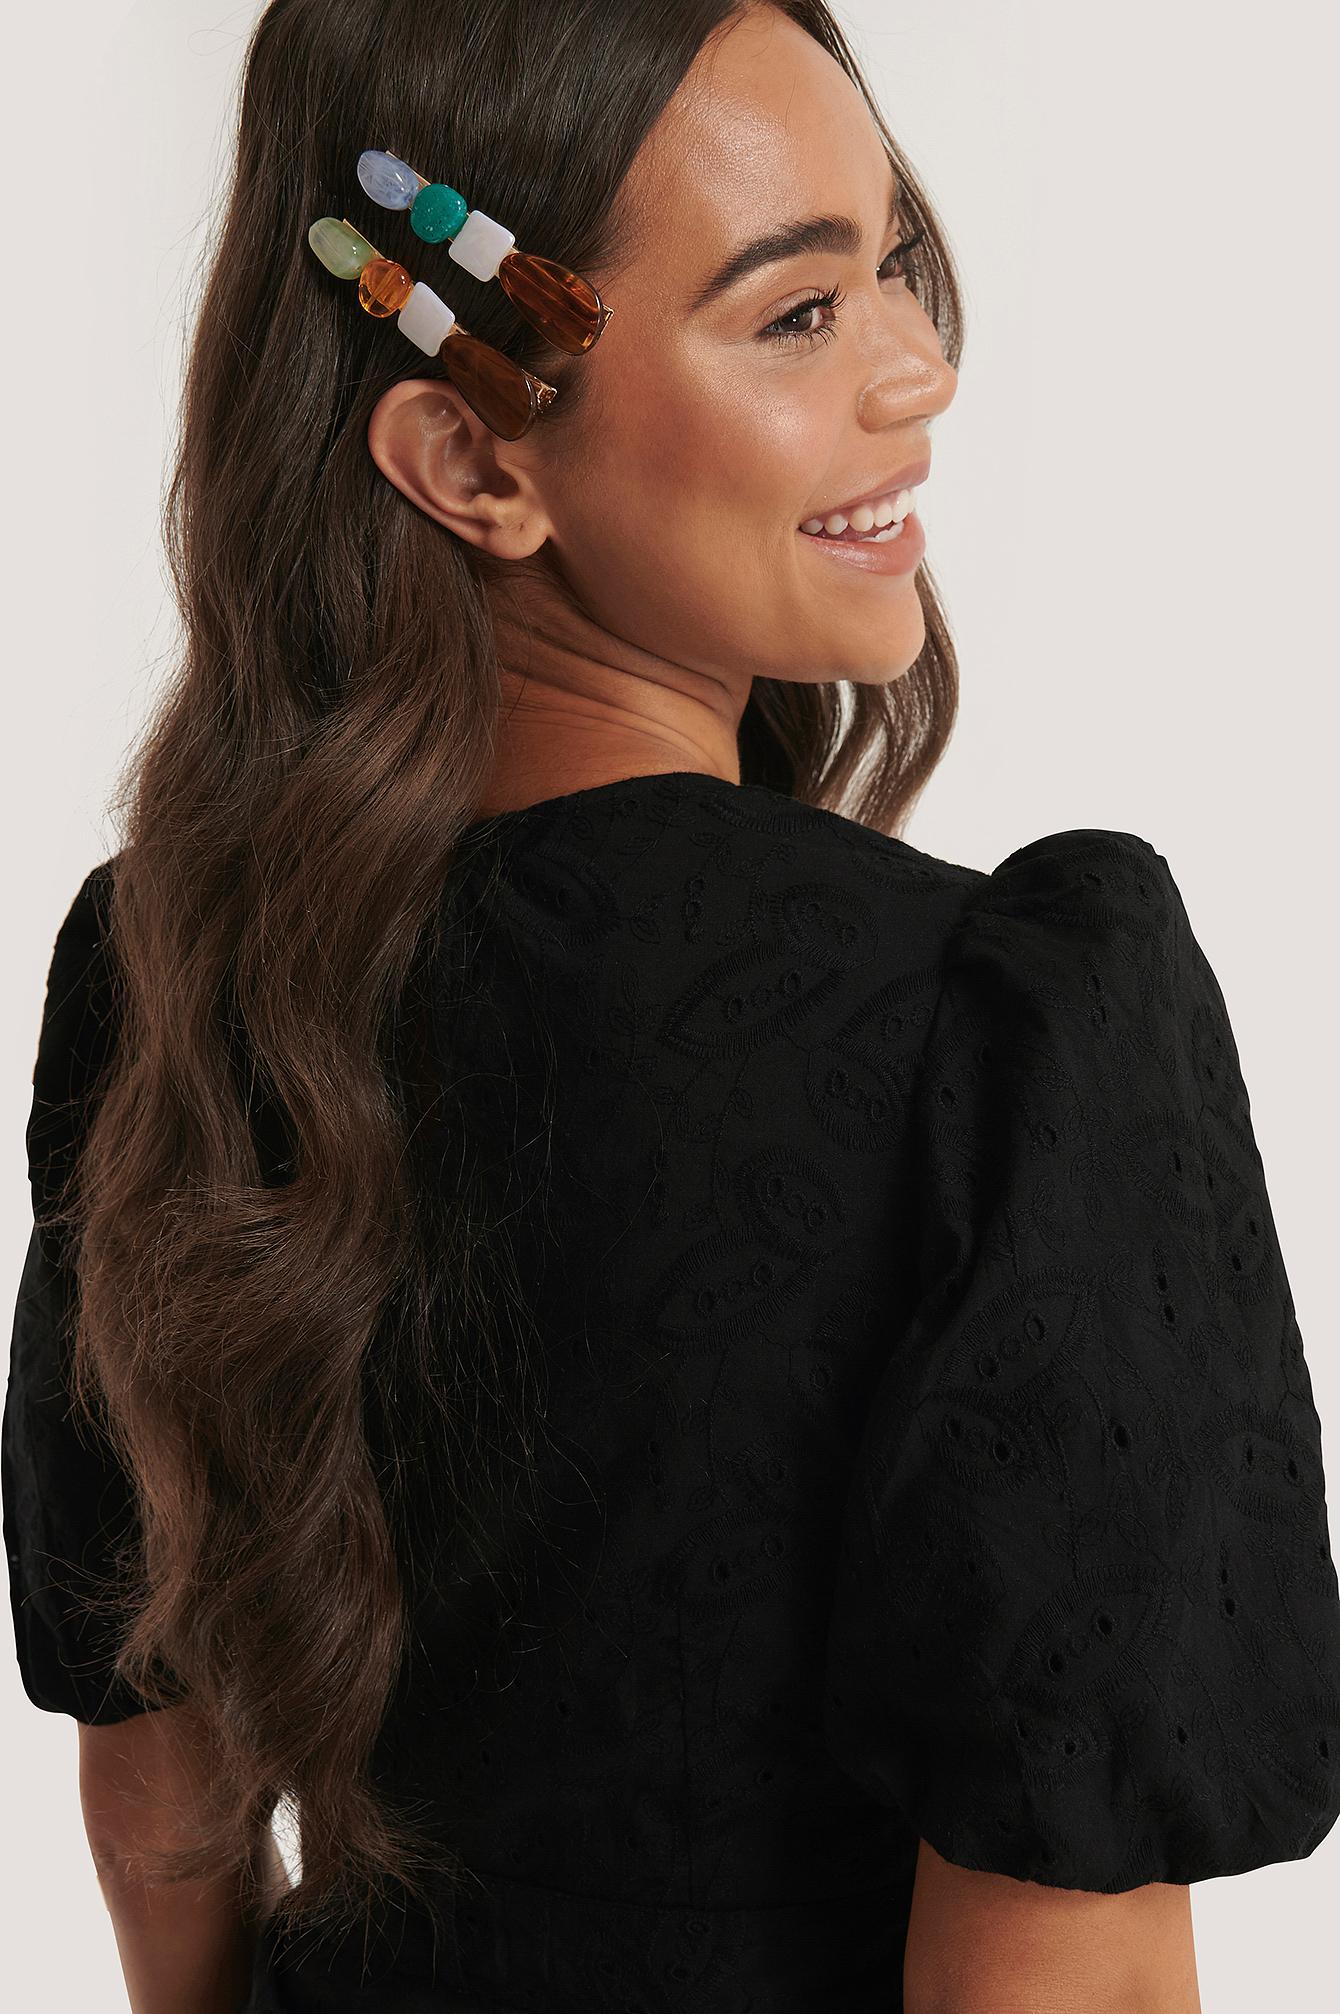 na-kd accessories -  Haarspangen-Set Ozean - Multicolor